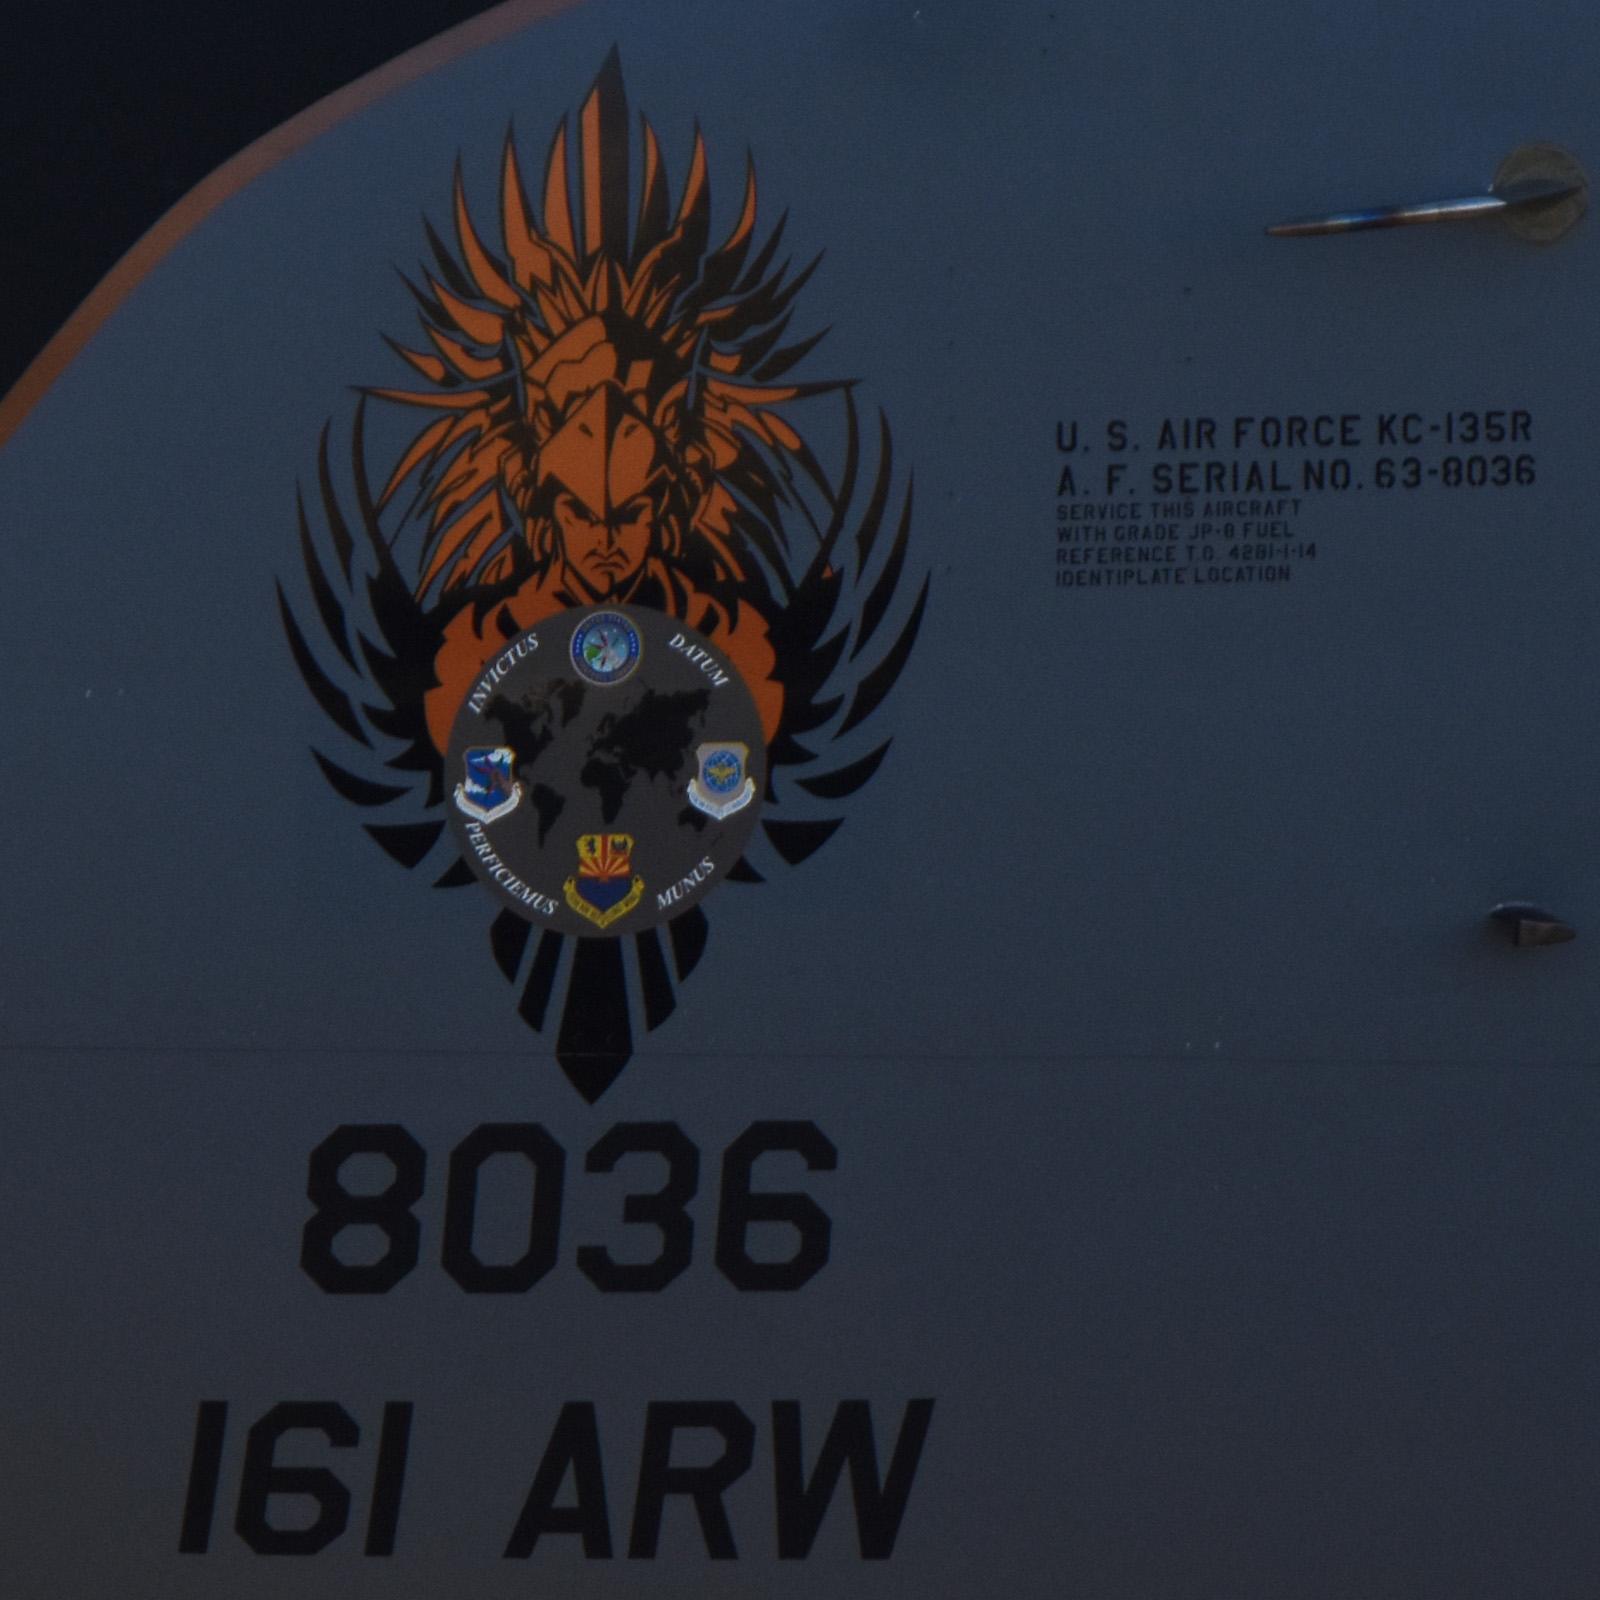 Arizona170413g949